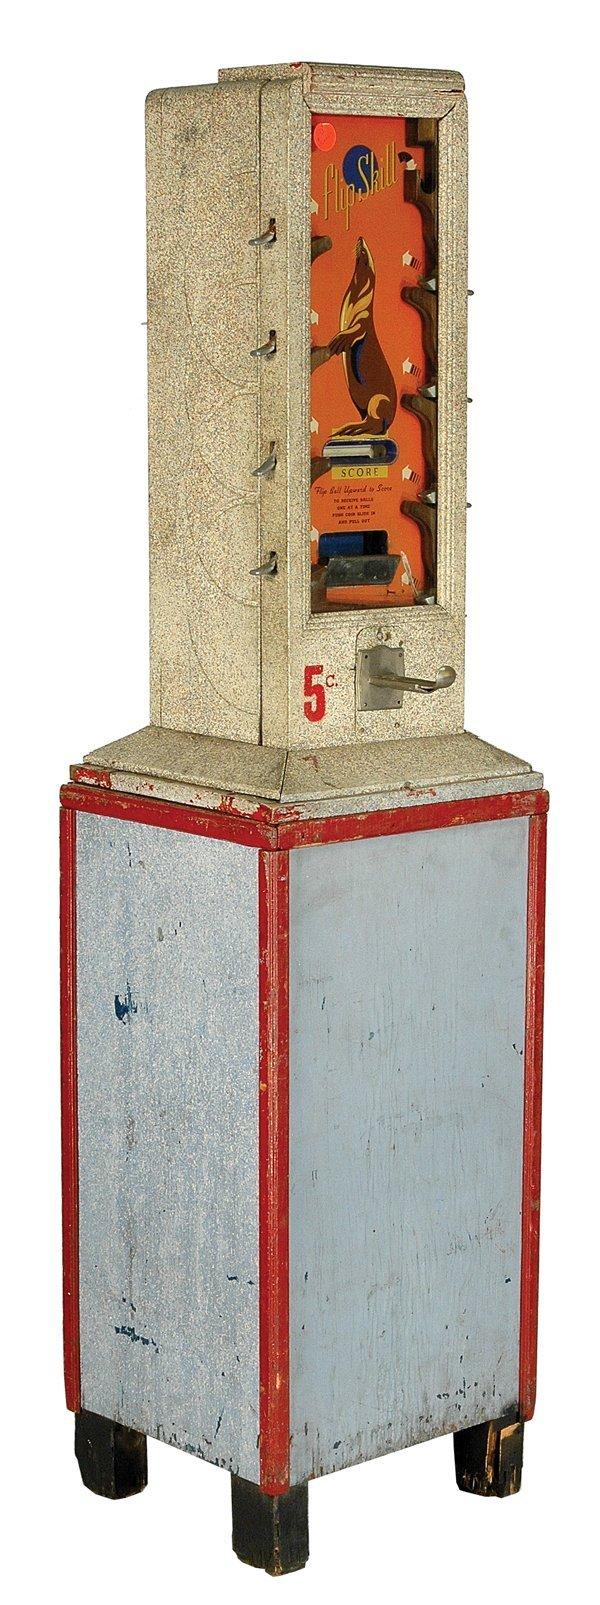 202: Flip Skill 5-Cent Machine.